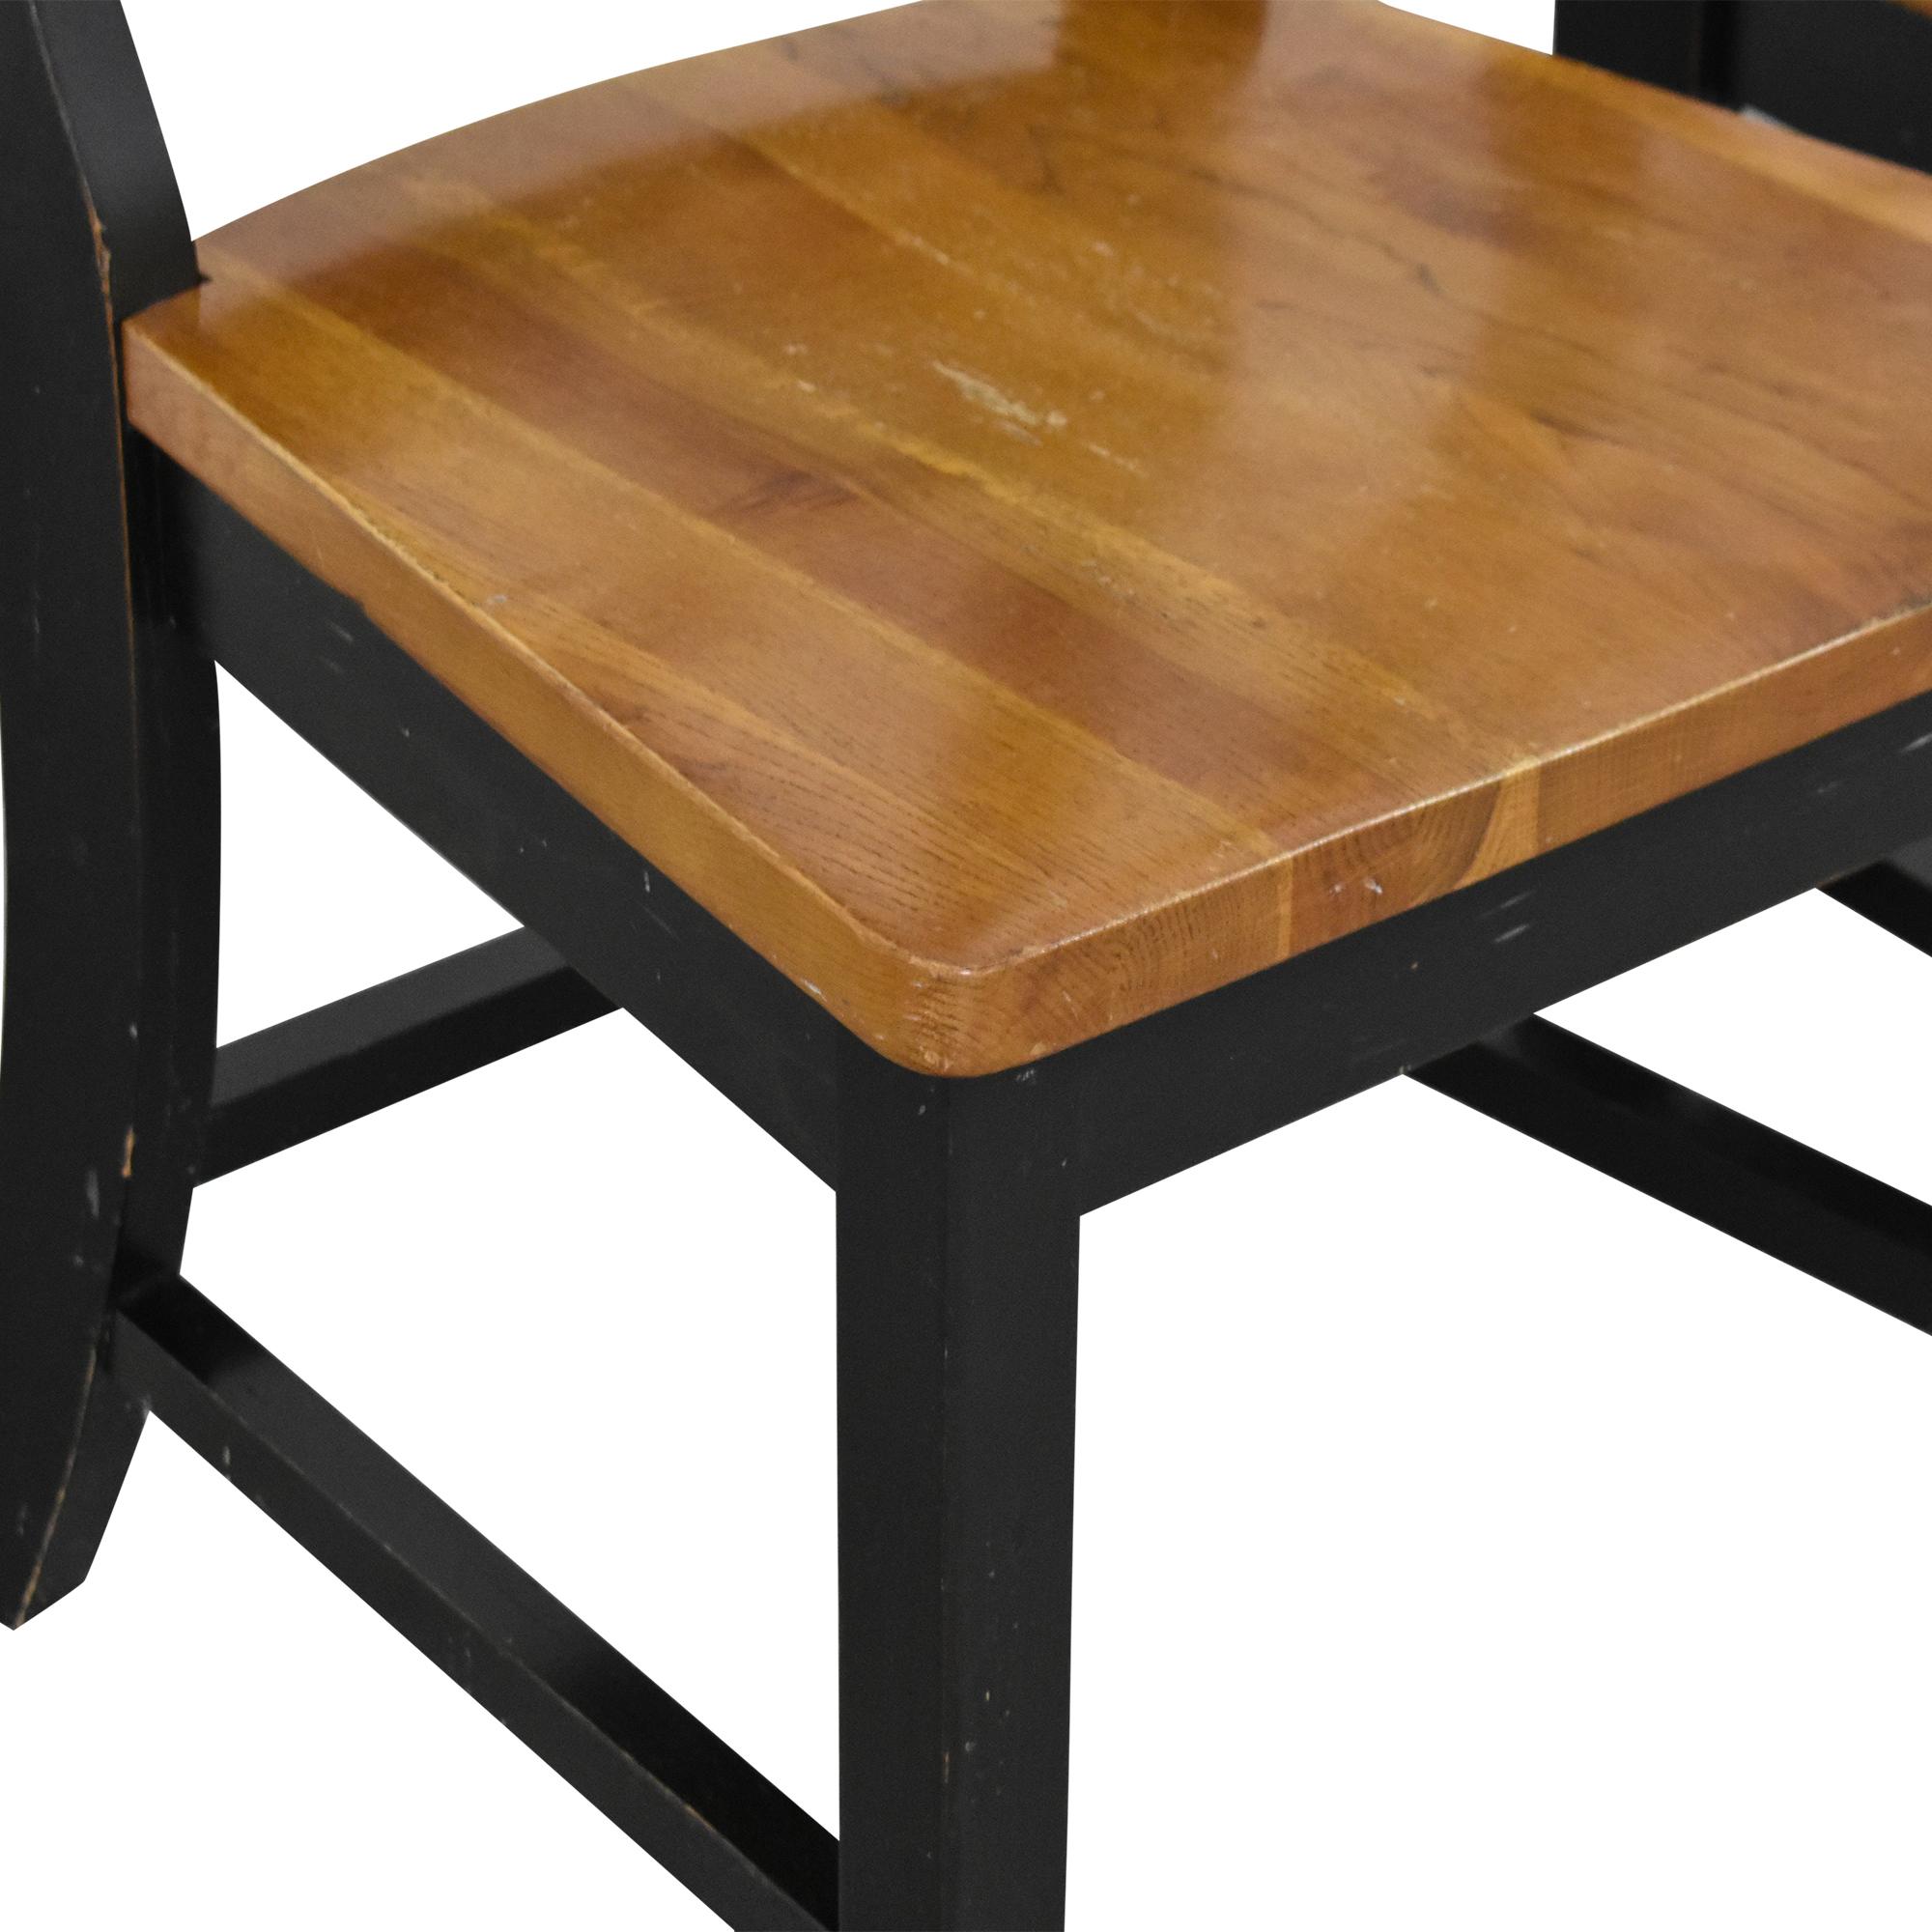 buy Havertys Havertys Timber Ridge Dining Chairs online